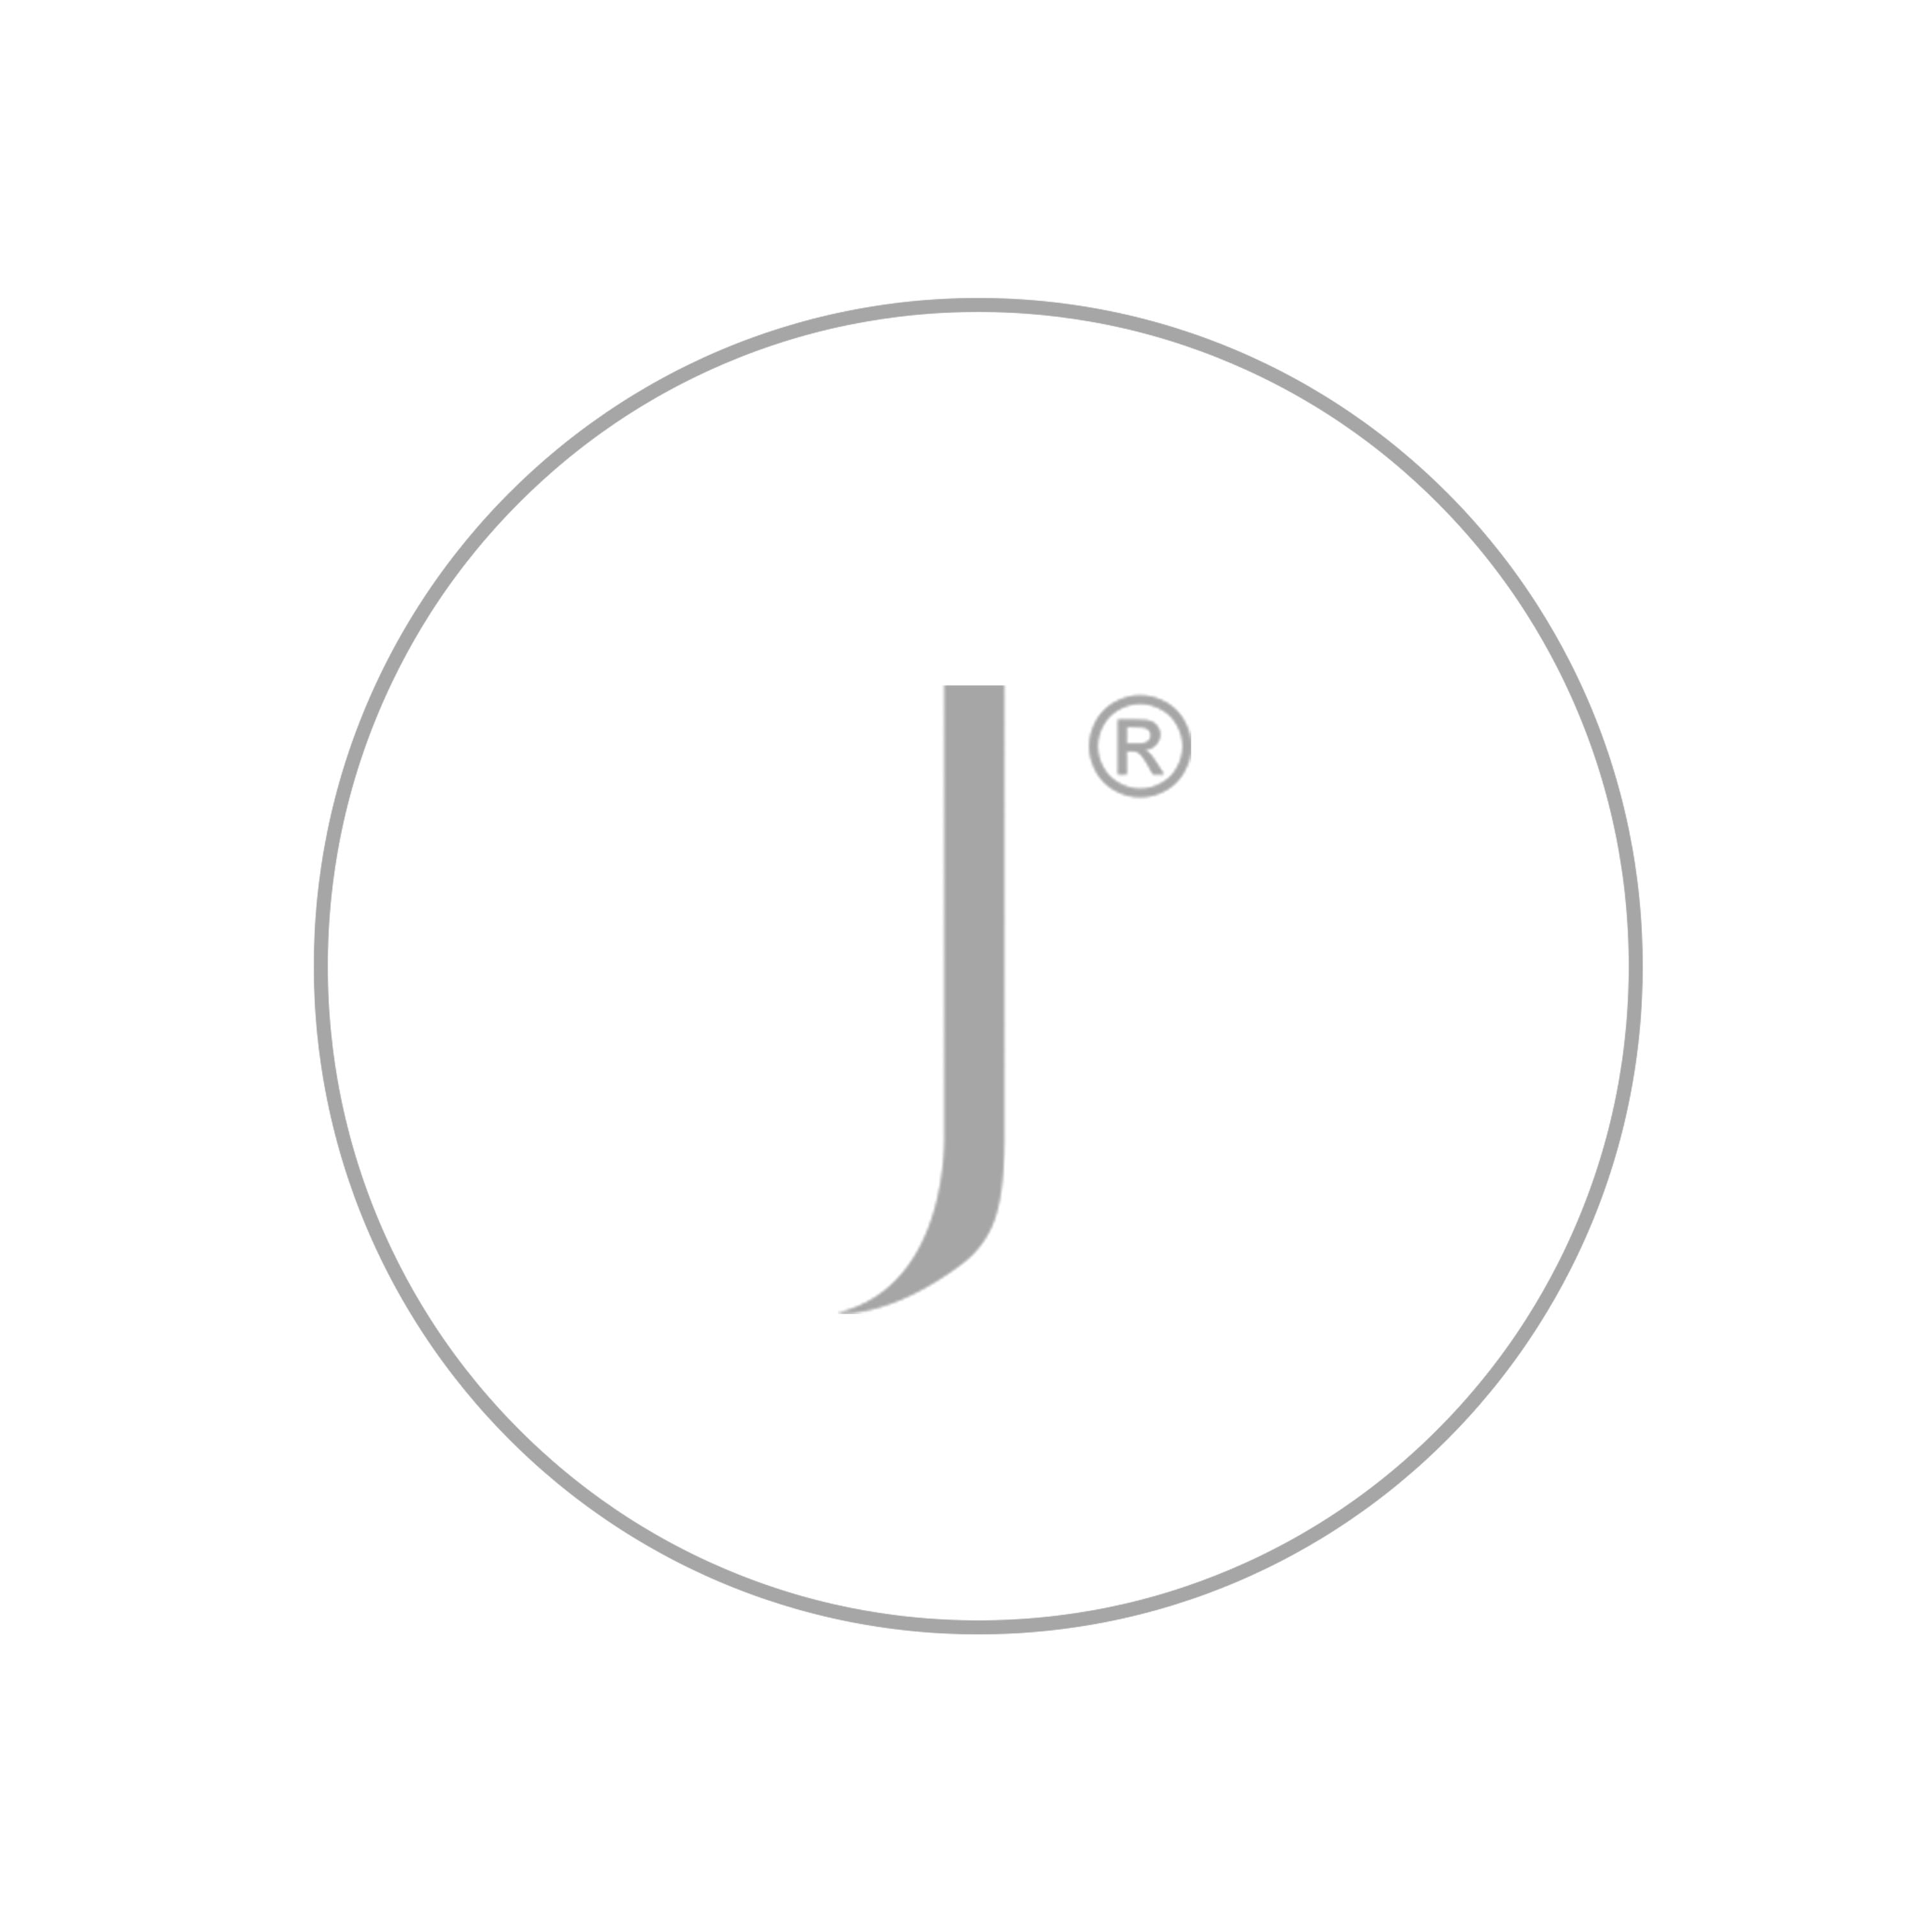 Silver Omega Cuff Bracelet